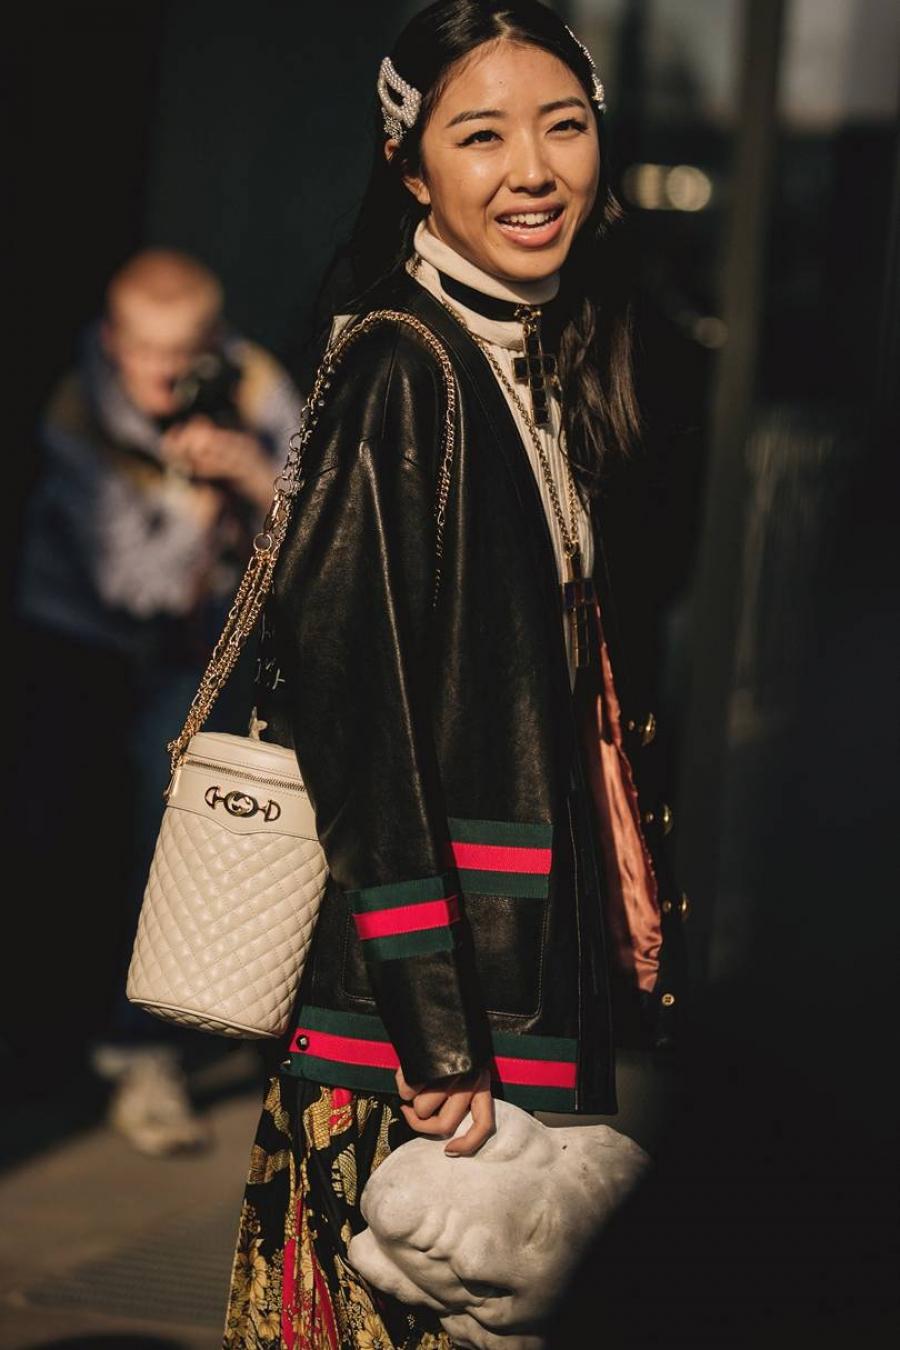 8189d7be41 Street Style απο την εβδομάδα μόδας του Μιλάνου - CityWoman